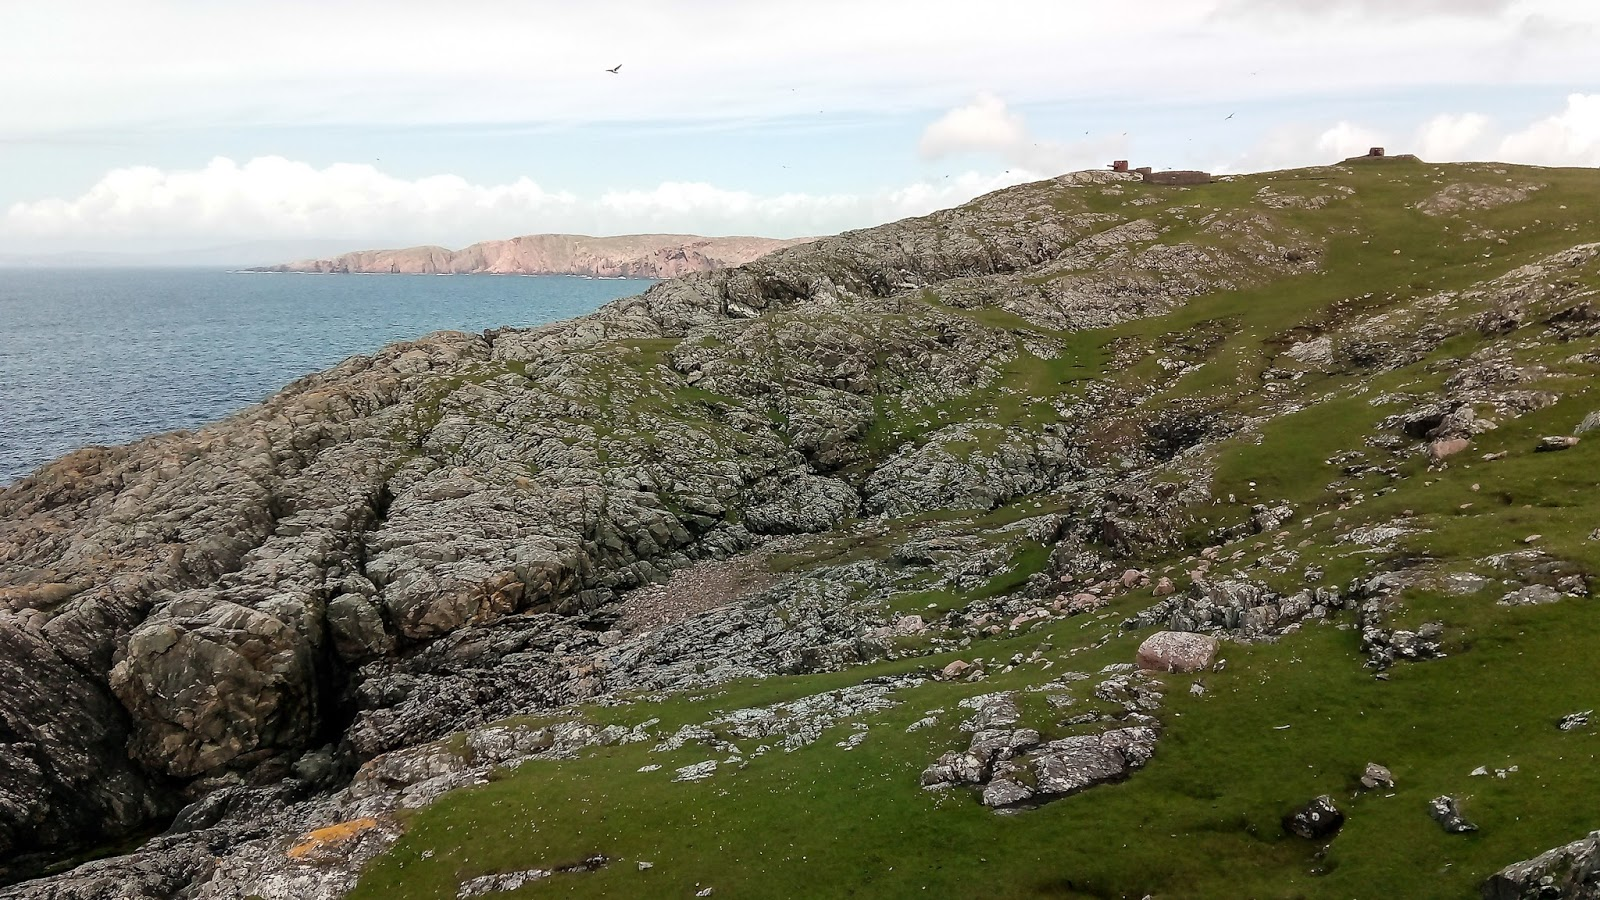 Ward of Bressay, Shetland Islands